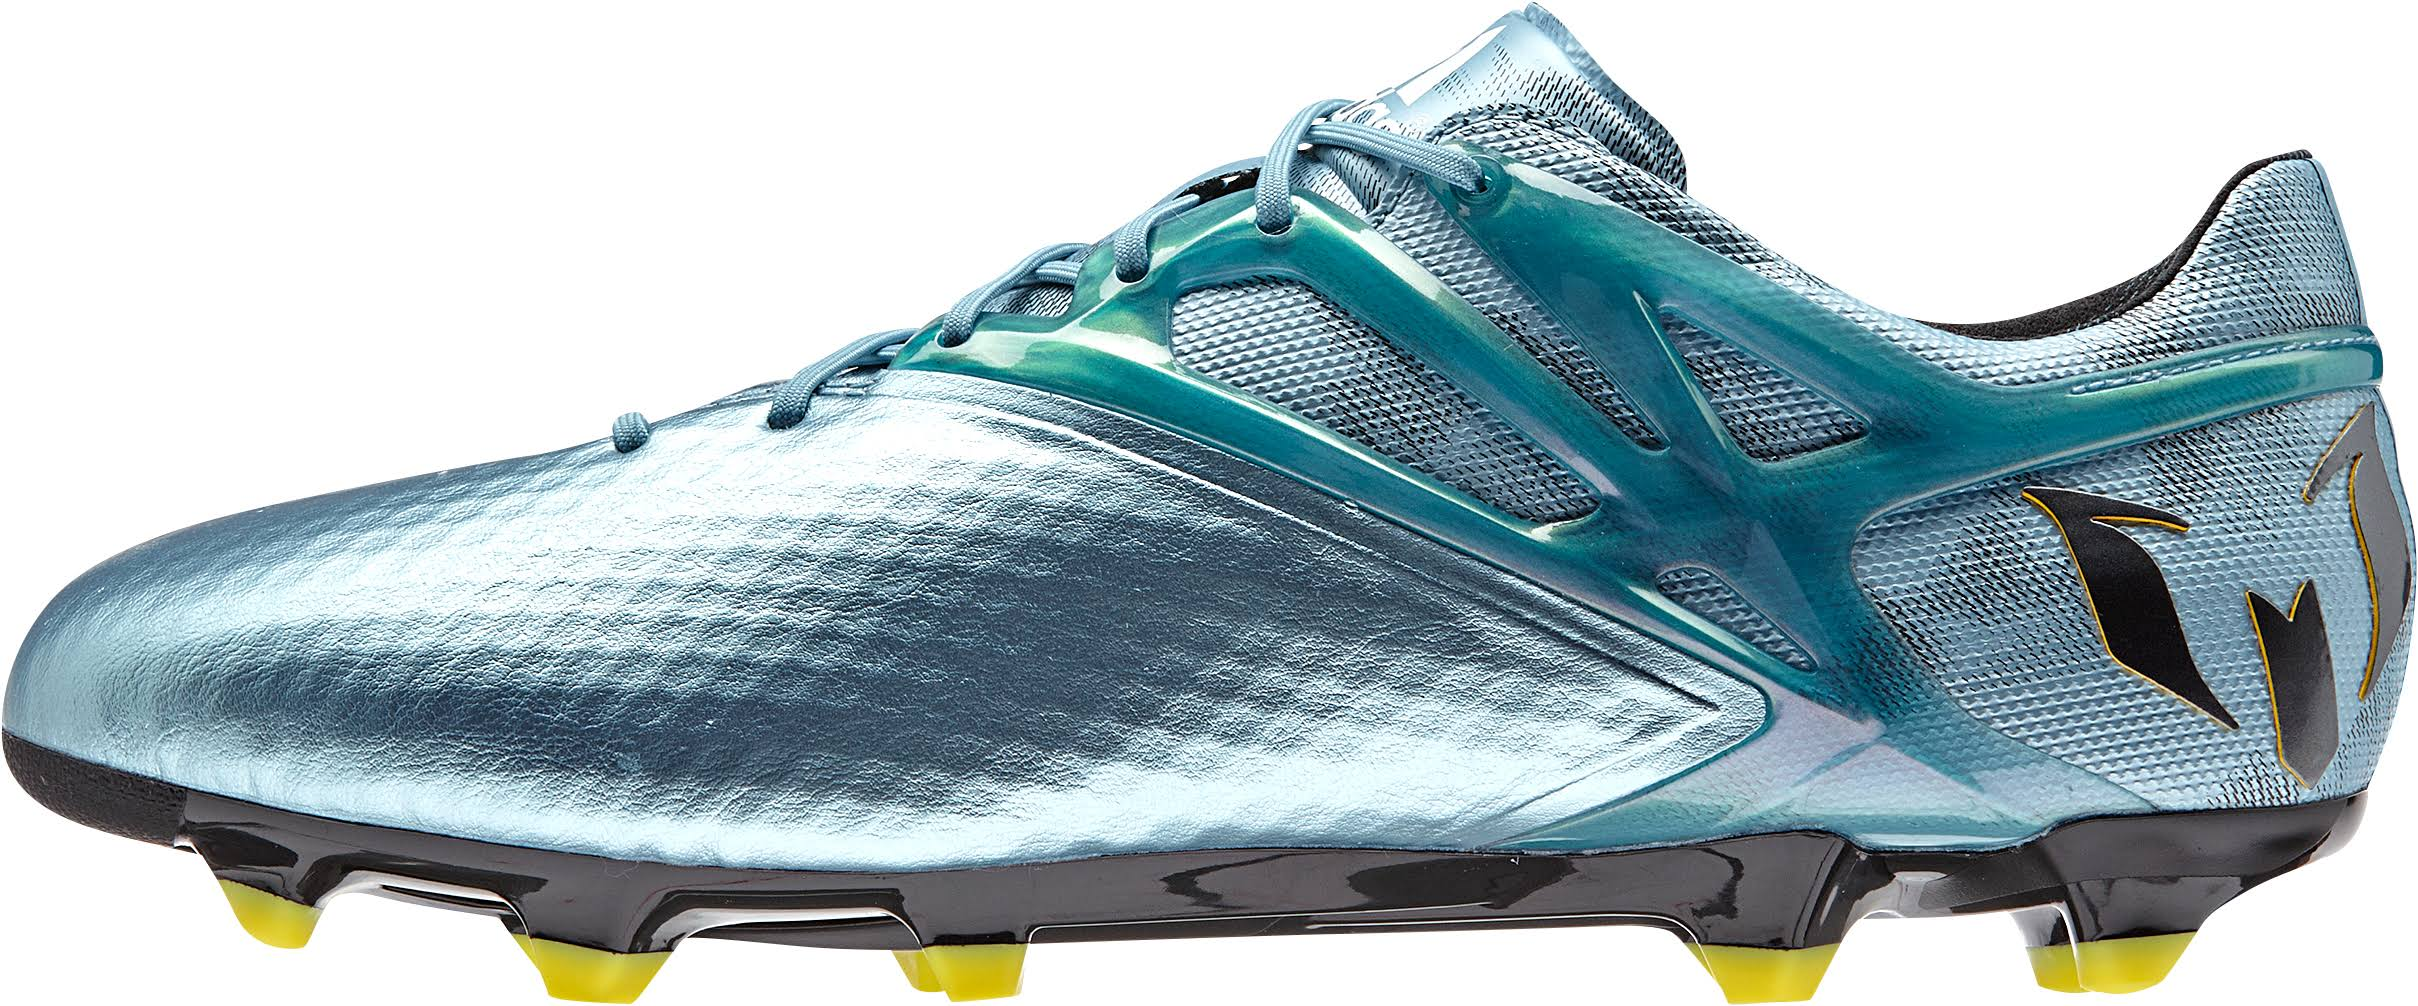 Adidas 15 Botas Agrícola Tierra Azul 1 De Para Firme Fútbol Hombre Messi r6Z1wr